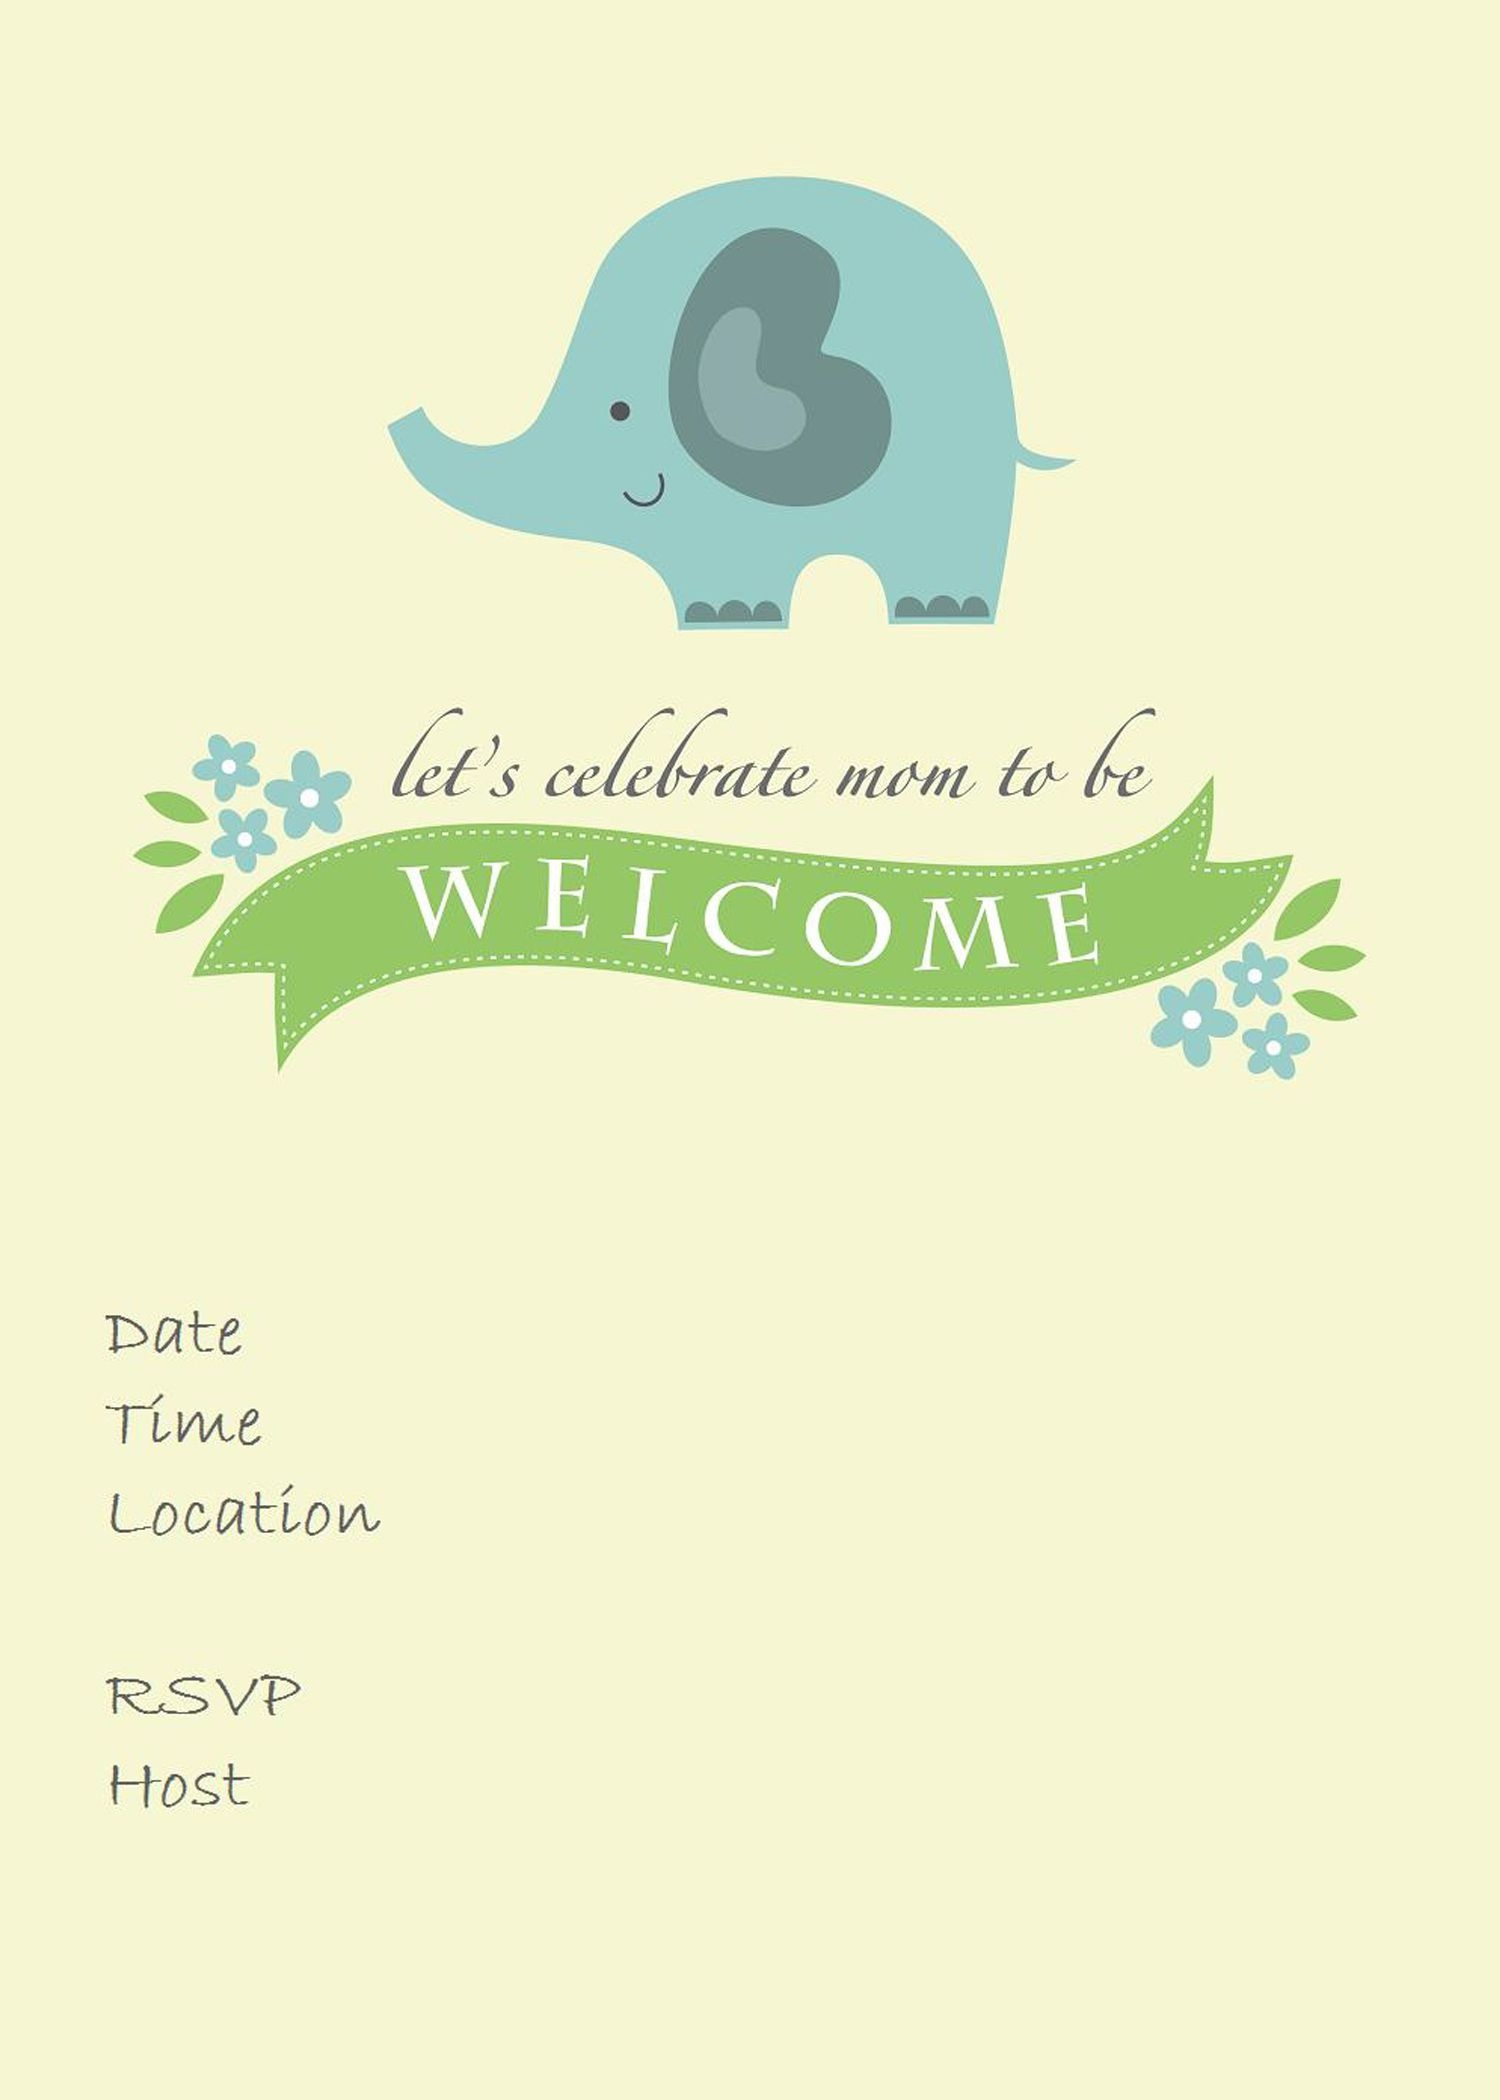 25 Adorable Free Printable Baby Shower Invitations - Free Printable Elephant Baby Shower Invitations